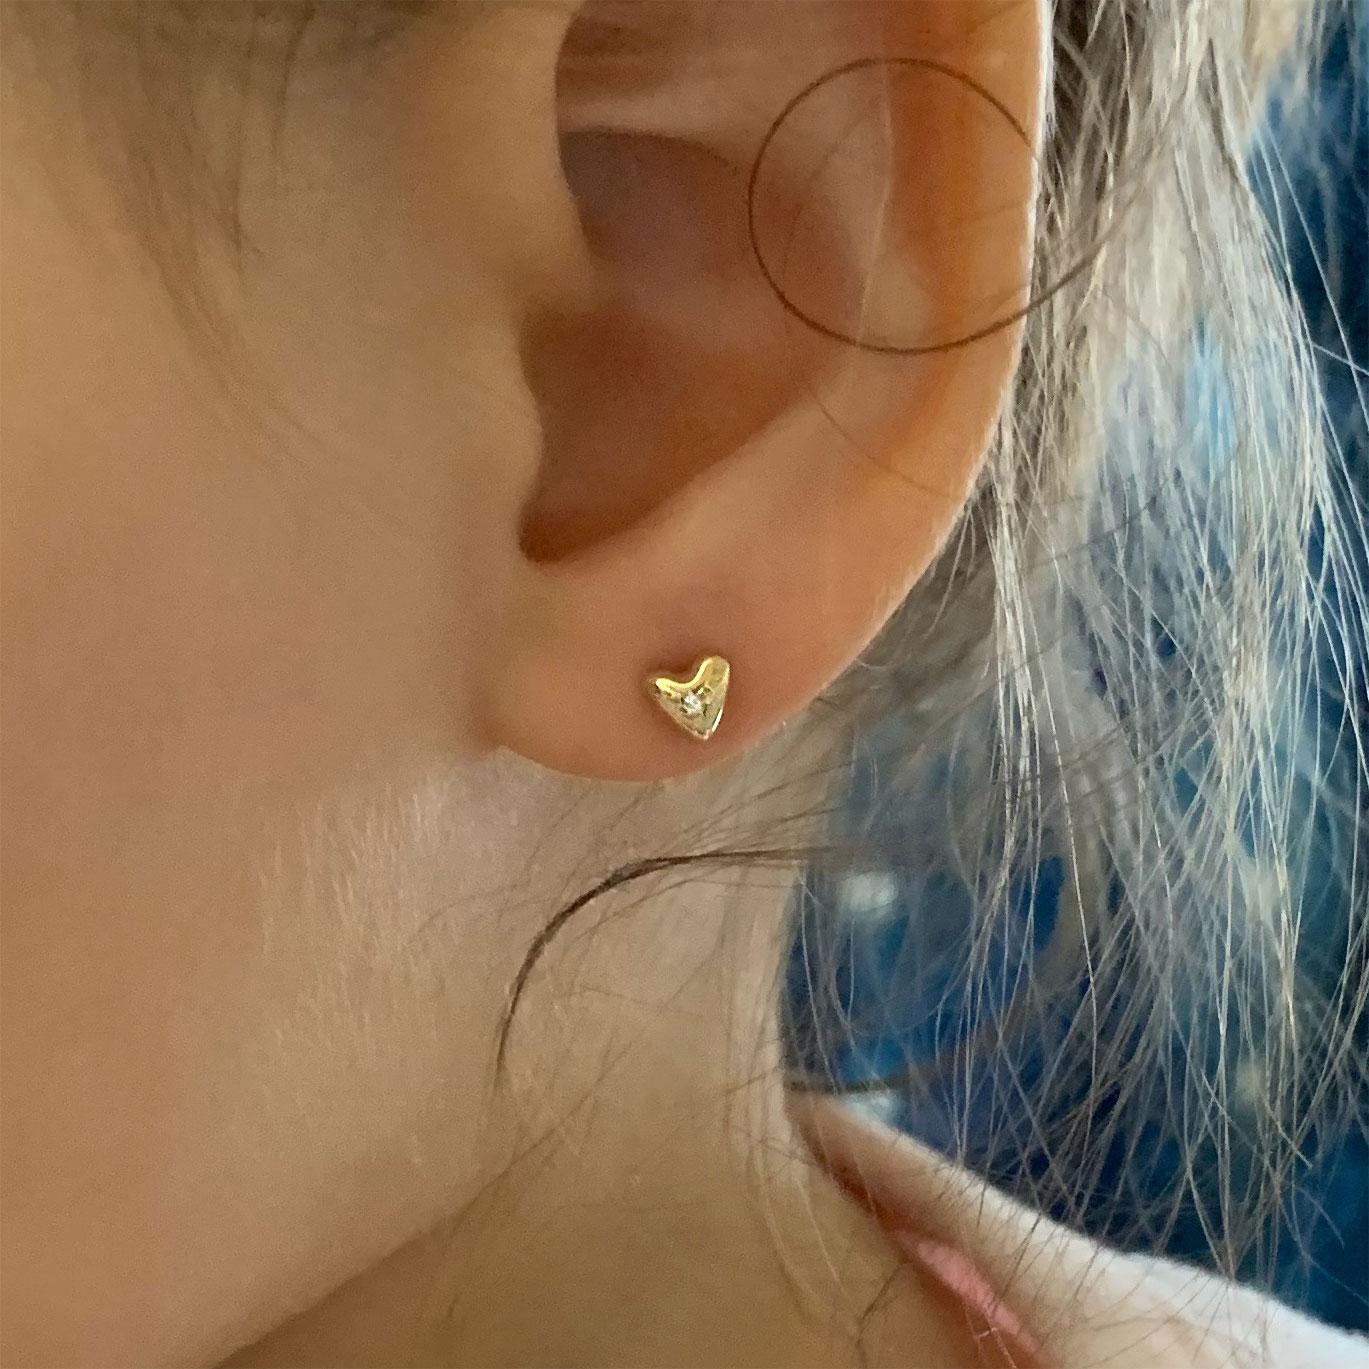 Baby Earrings